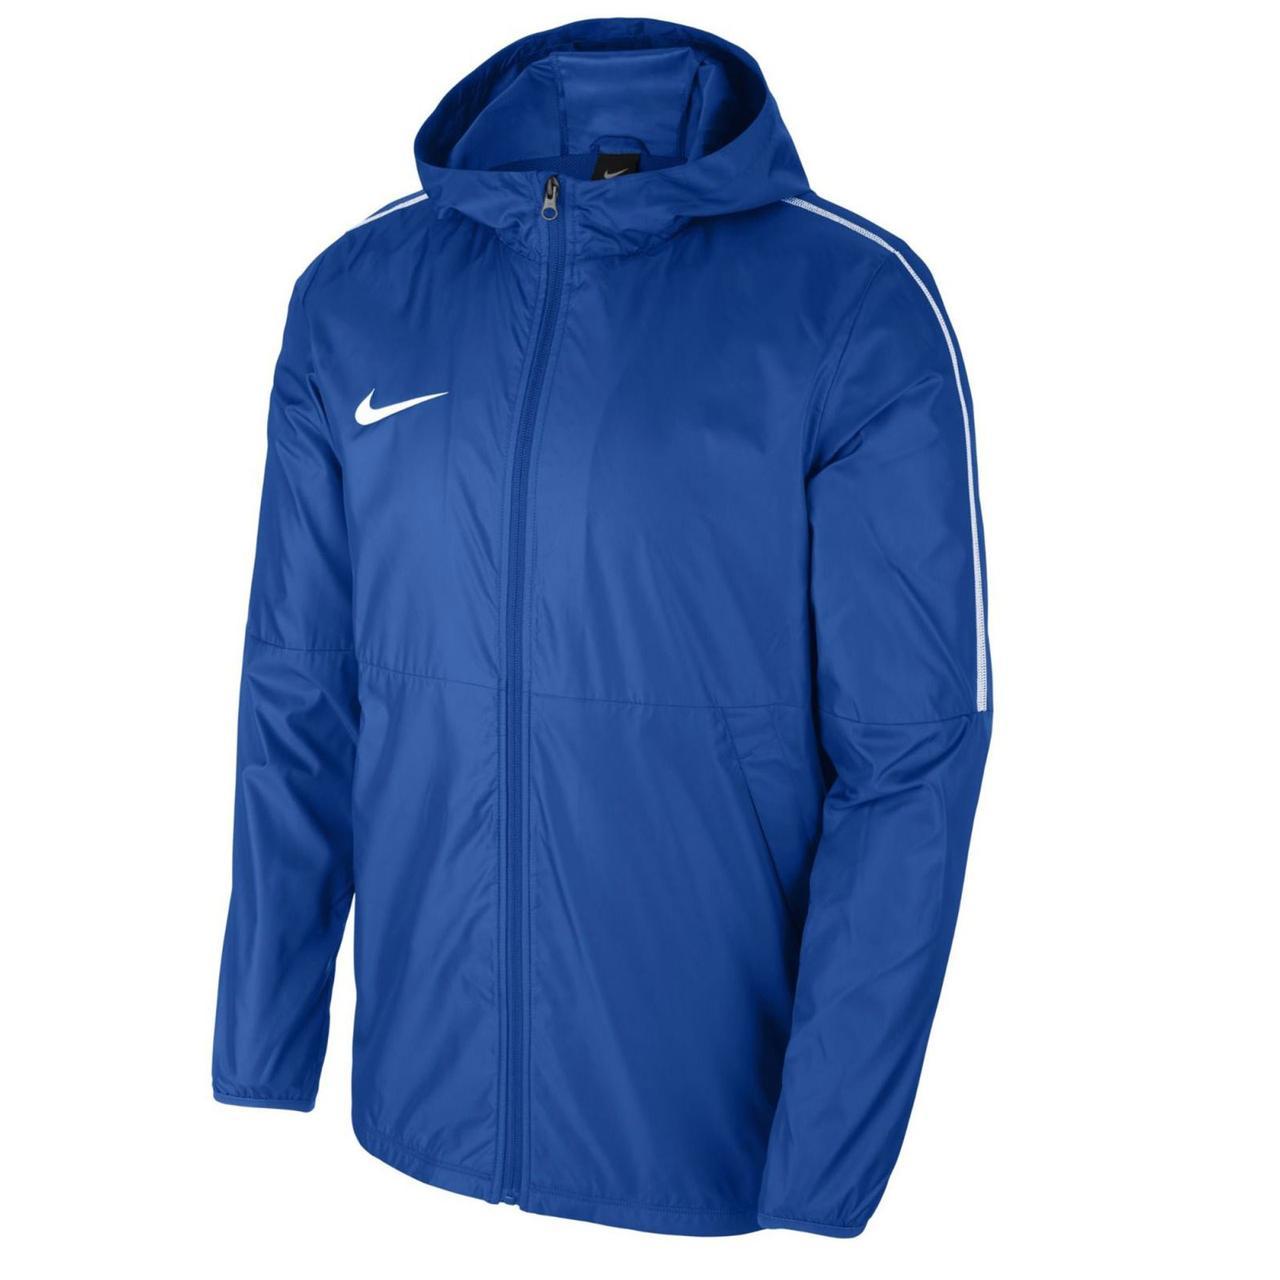 a7a0d97e Ветровка Nike Dry Park 18 Rain Jacket AA2090-463 (Оригинал) - Football Mall